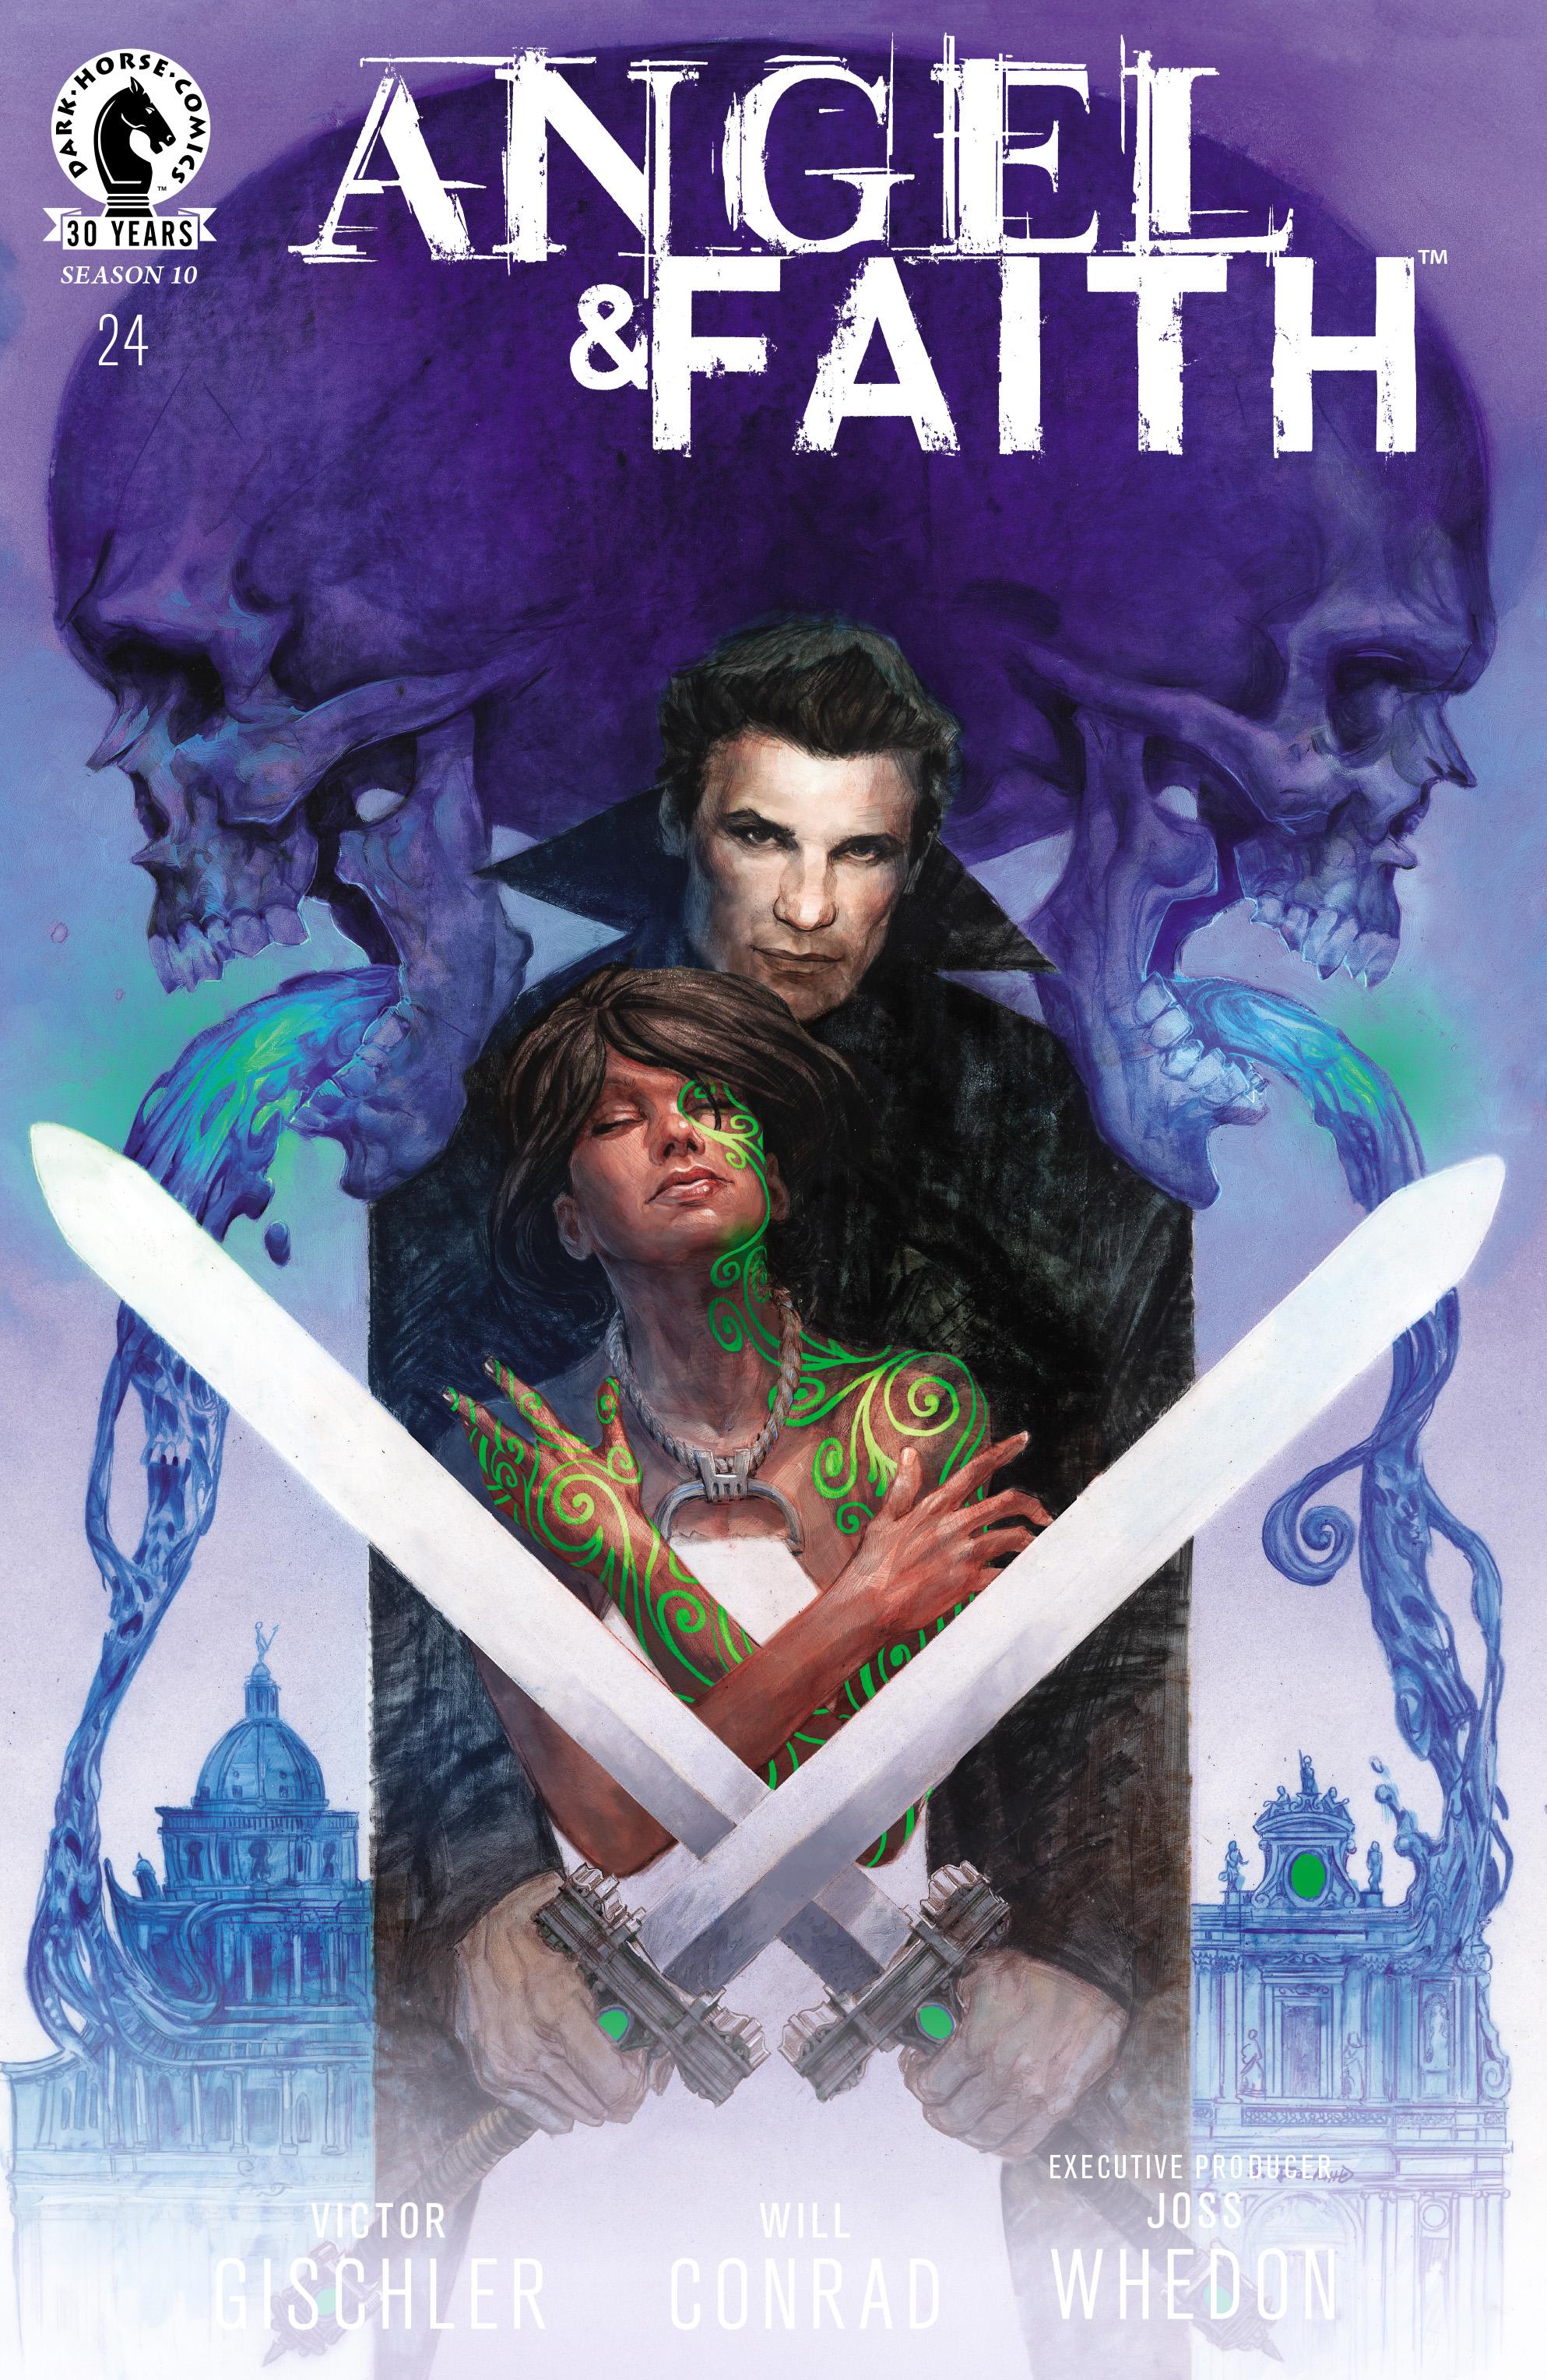 Read online Angel & Faith Season 10 comic -  Issue #24 - 1